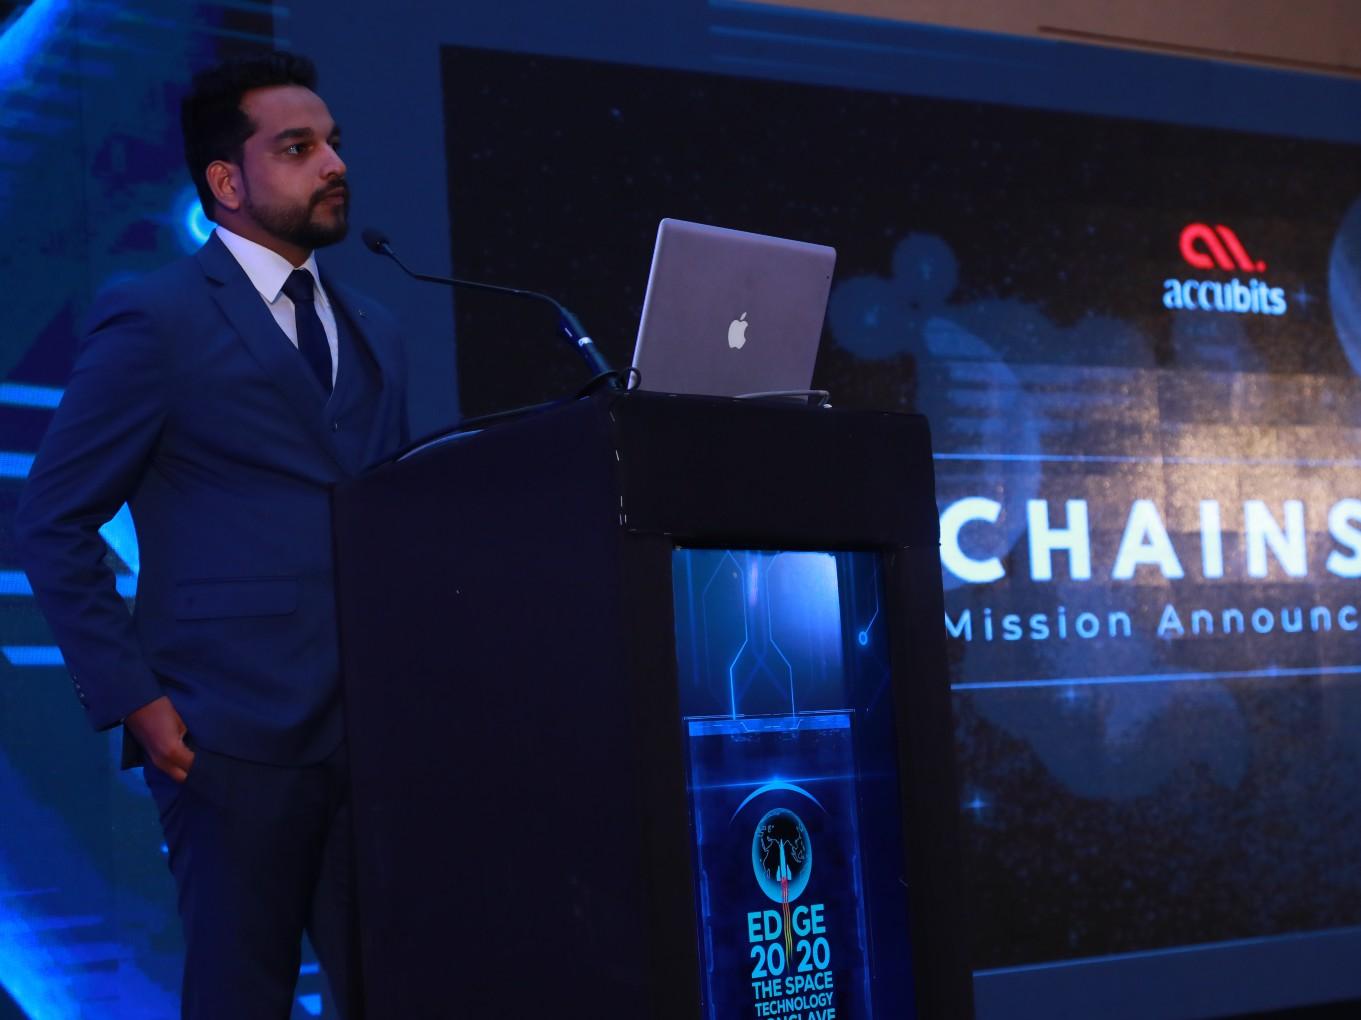 Accubits Technologies To Launch World's First Enterprise Blockchain Satellite